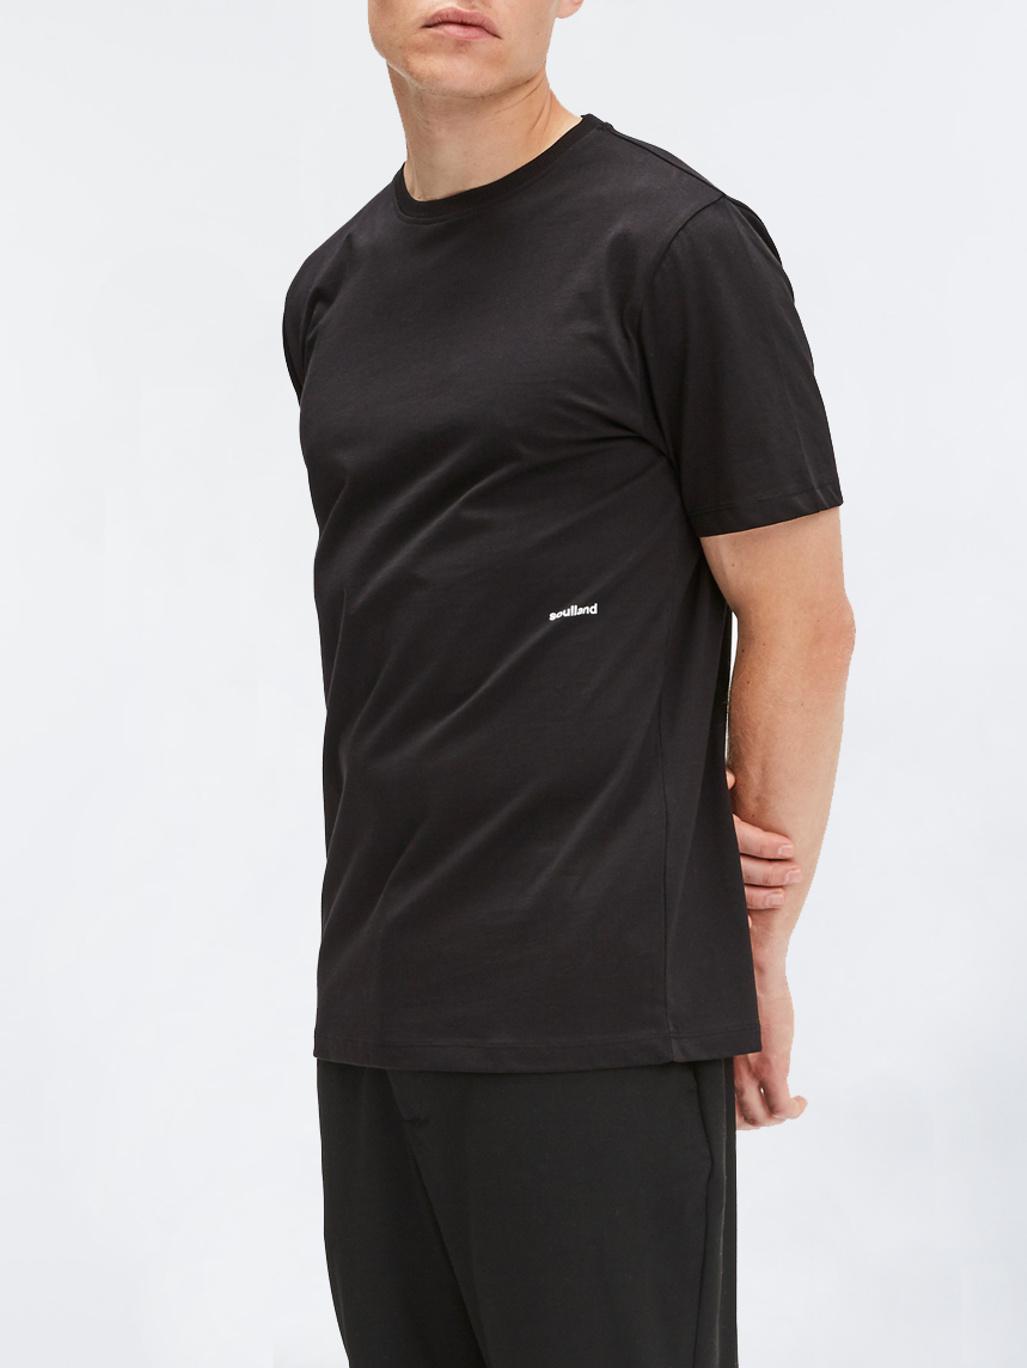 af3b89677896 Logic Coffey T-Shirt Black - Soulland